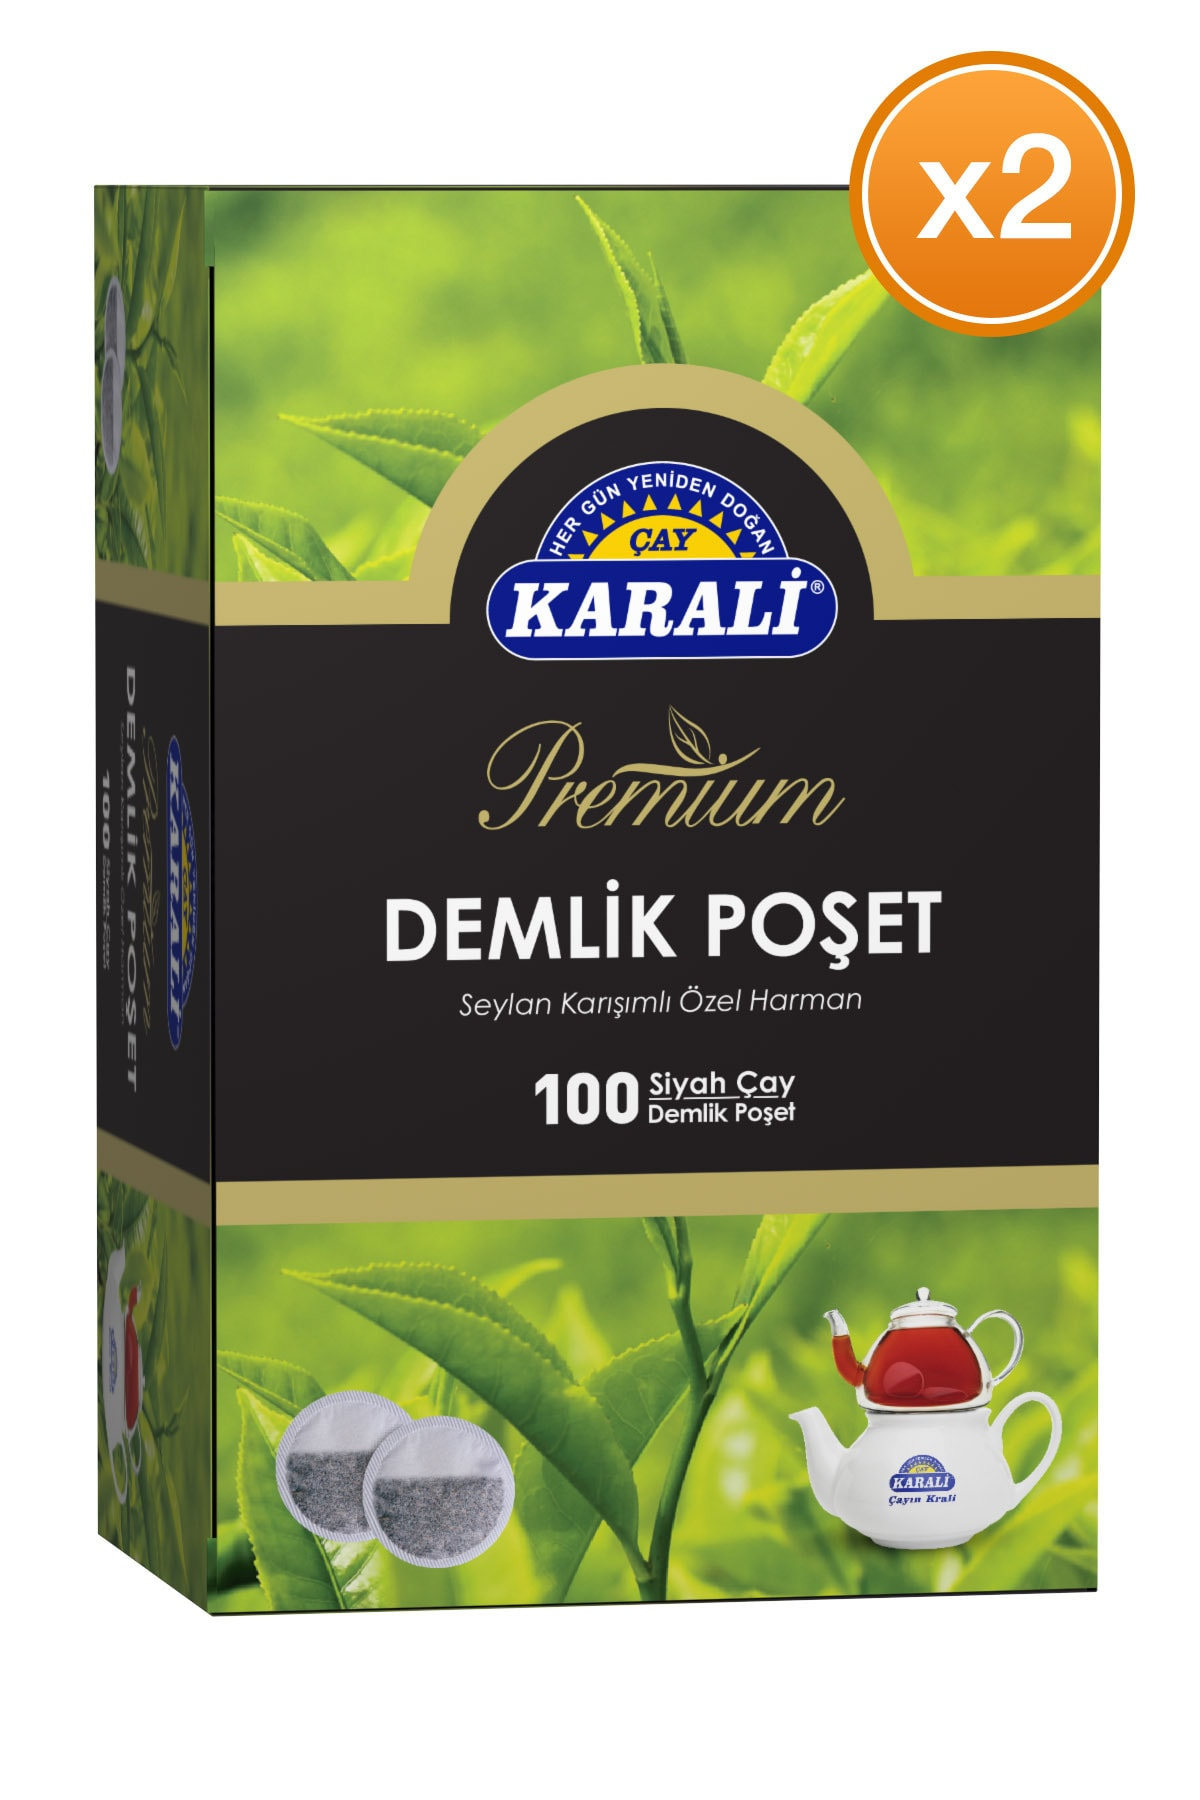 Karali Premium Demlik Poşet Siyah Çay 100x3,2 gr X 2 Adet